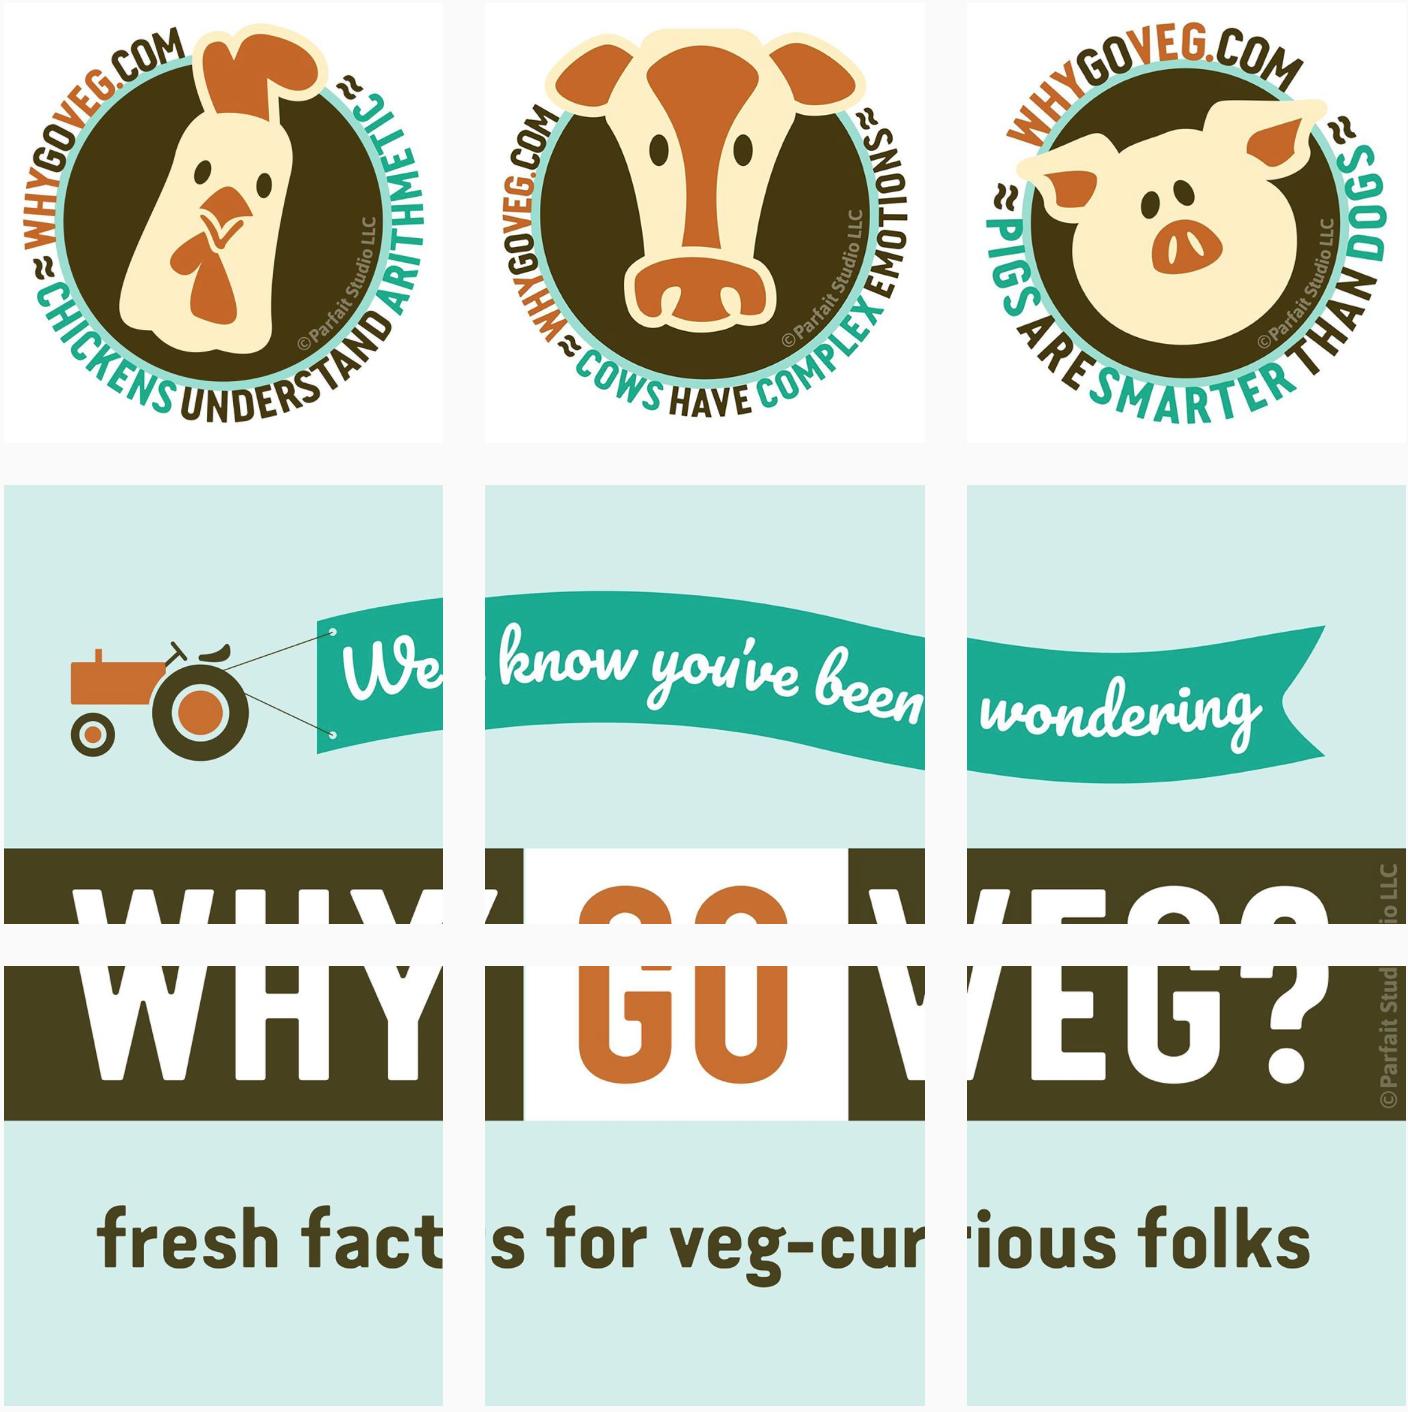 Why Go Veg? Instagram Feed